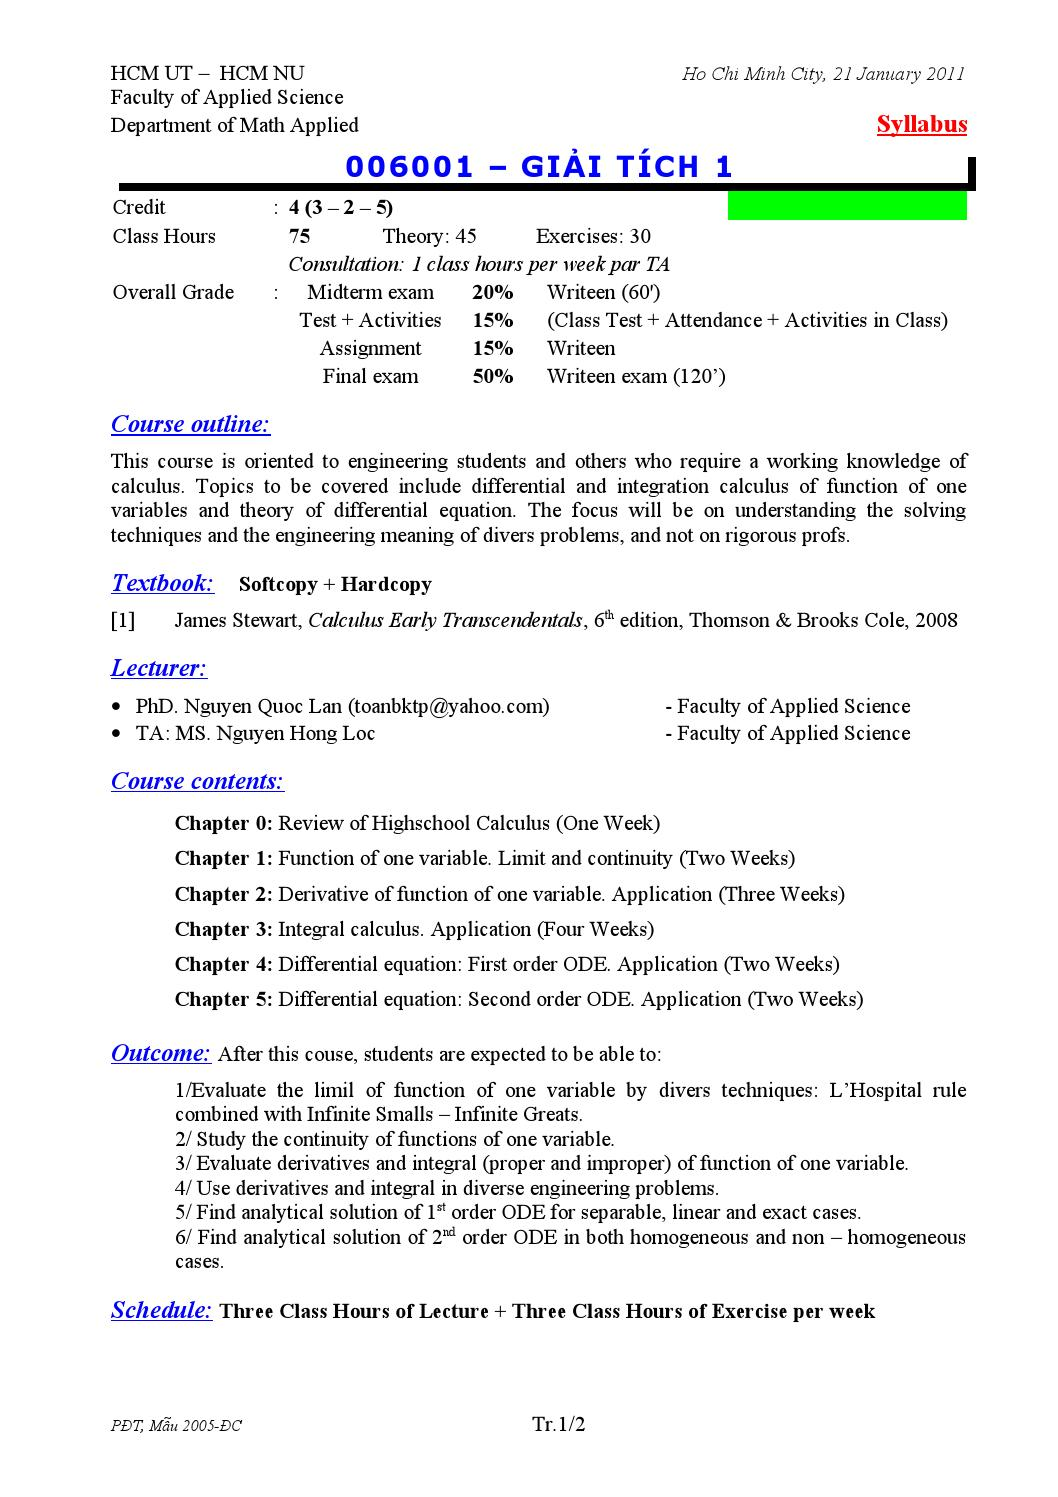 1 006001 calculus by Thuy Ngoc - issuu